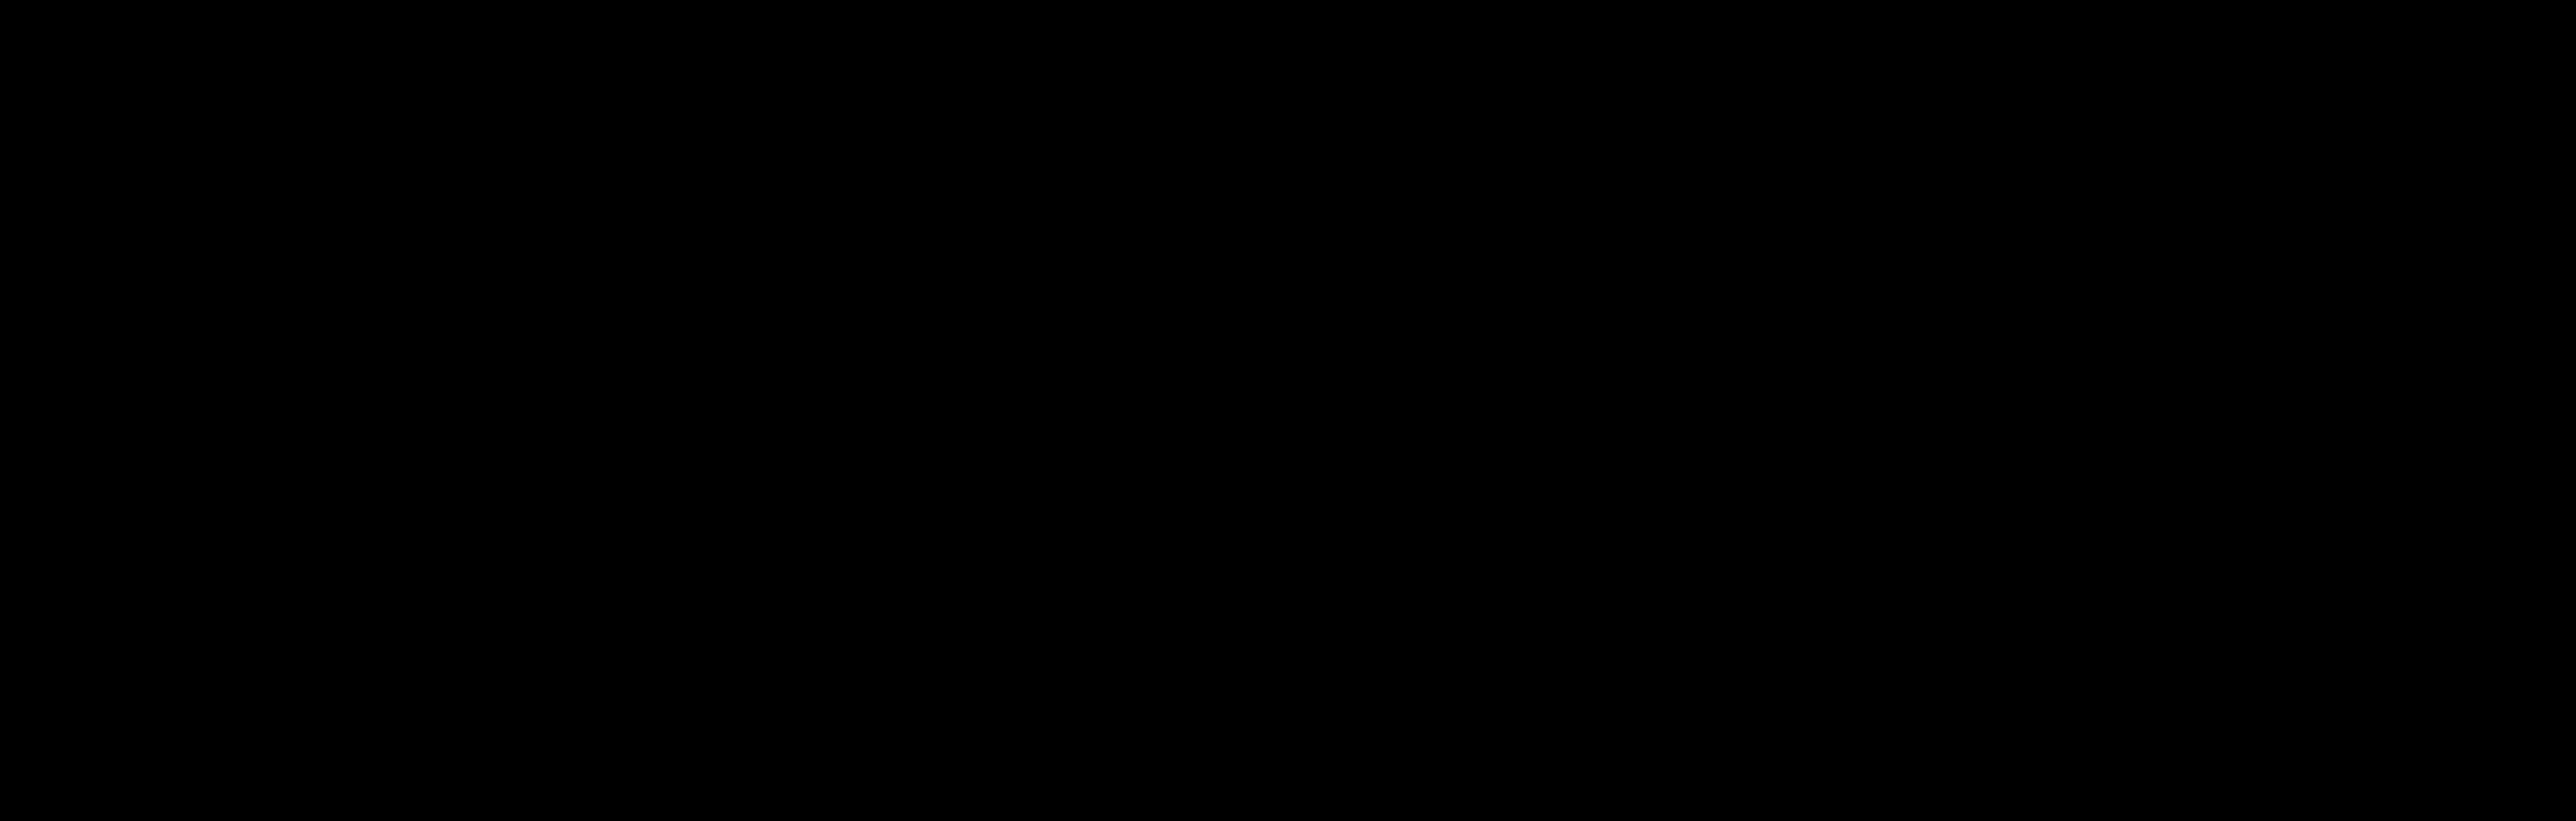 Paired Brand logo